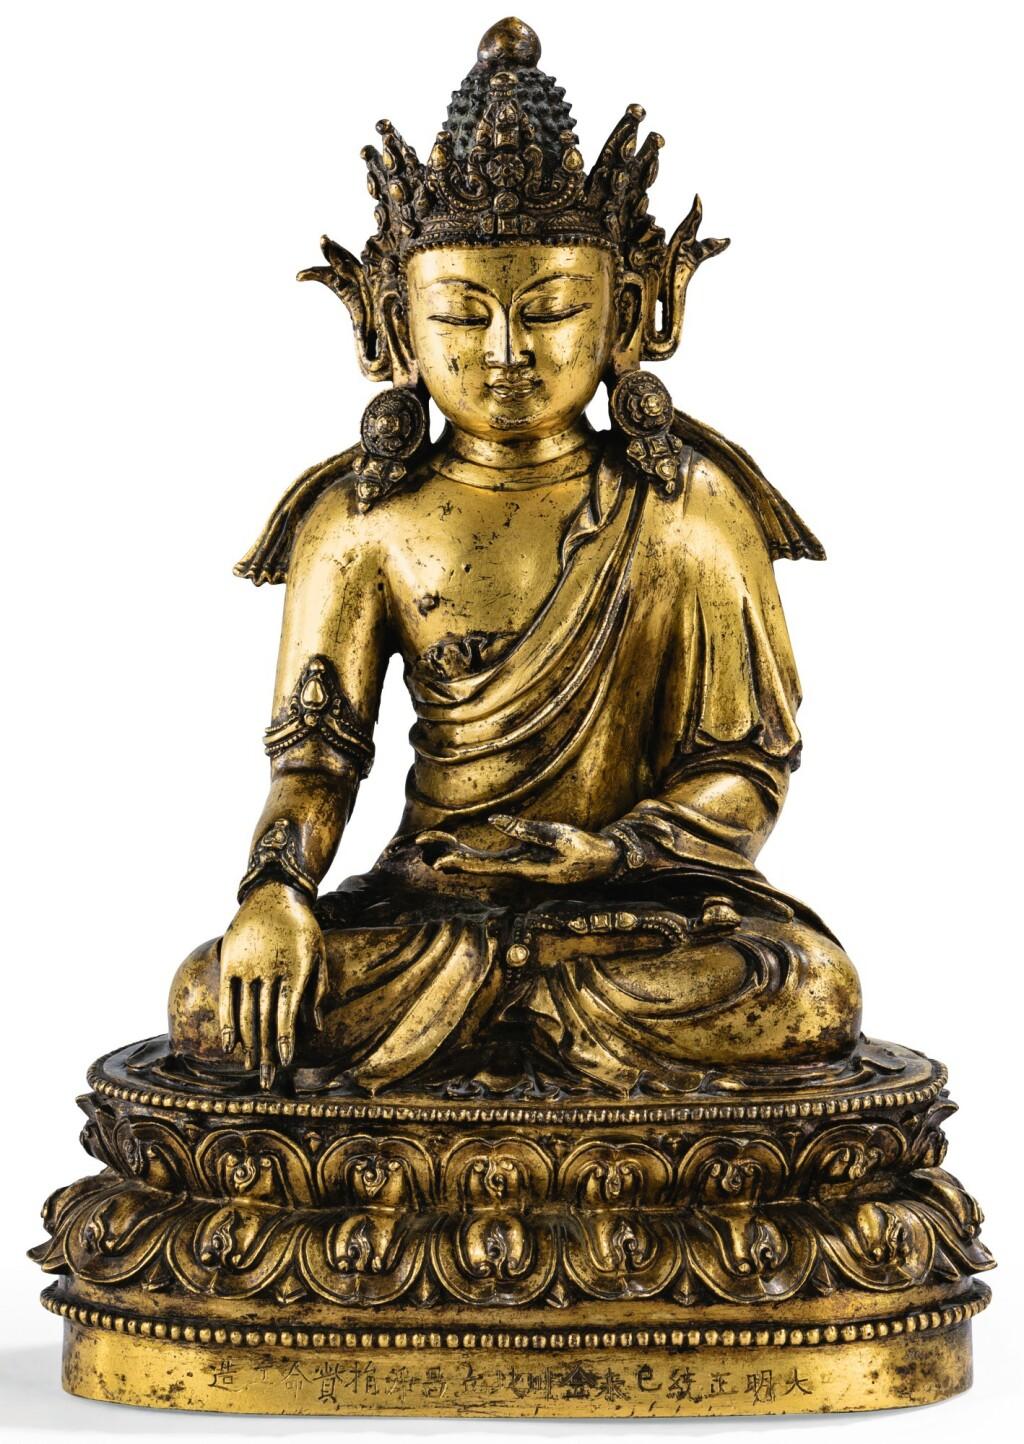 TRÈS RARE STATUETTE DU BOUDDHA AKSHOBYA EN BRONZE DORÉ MARQUE ET ÉPOQUE ZHENGTONG, DATÉE 1439 | 明正統 鎏金銅阿閦佛坐像  《大明正統己未金川北丘昌淨捐貲命工造》款 | A very rare gilt-bronze figure of Akshobya, Zhengtong mark and period, dated 1439